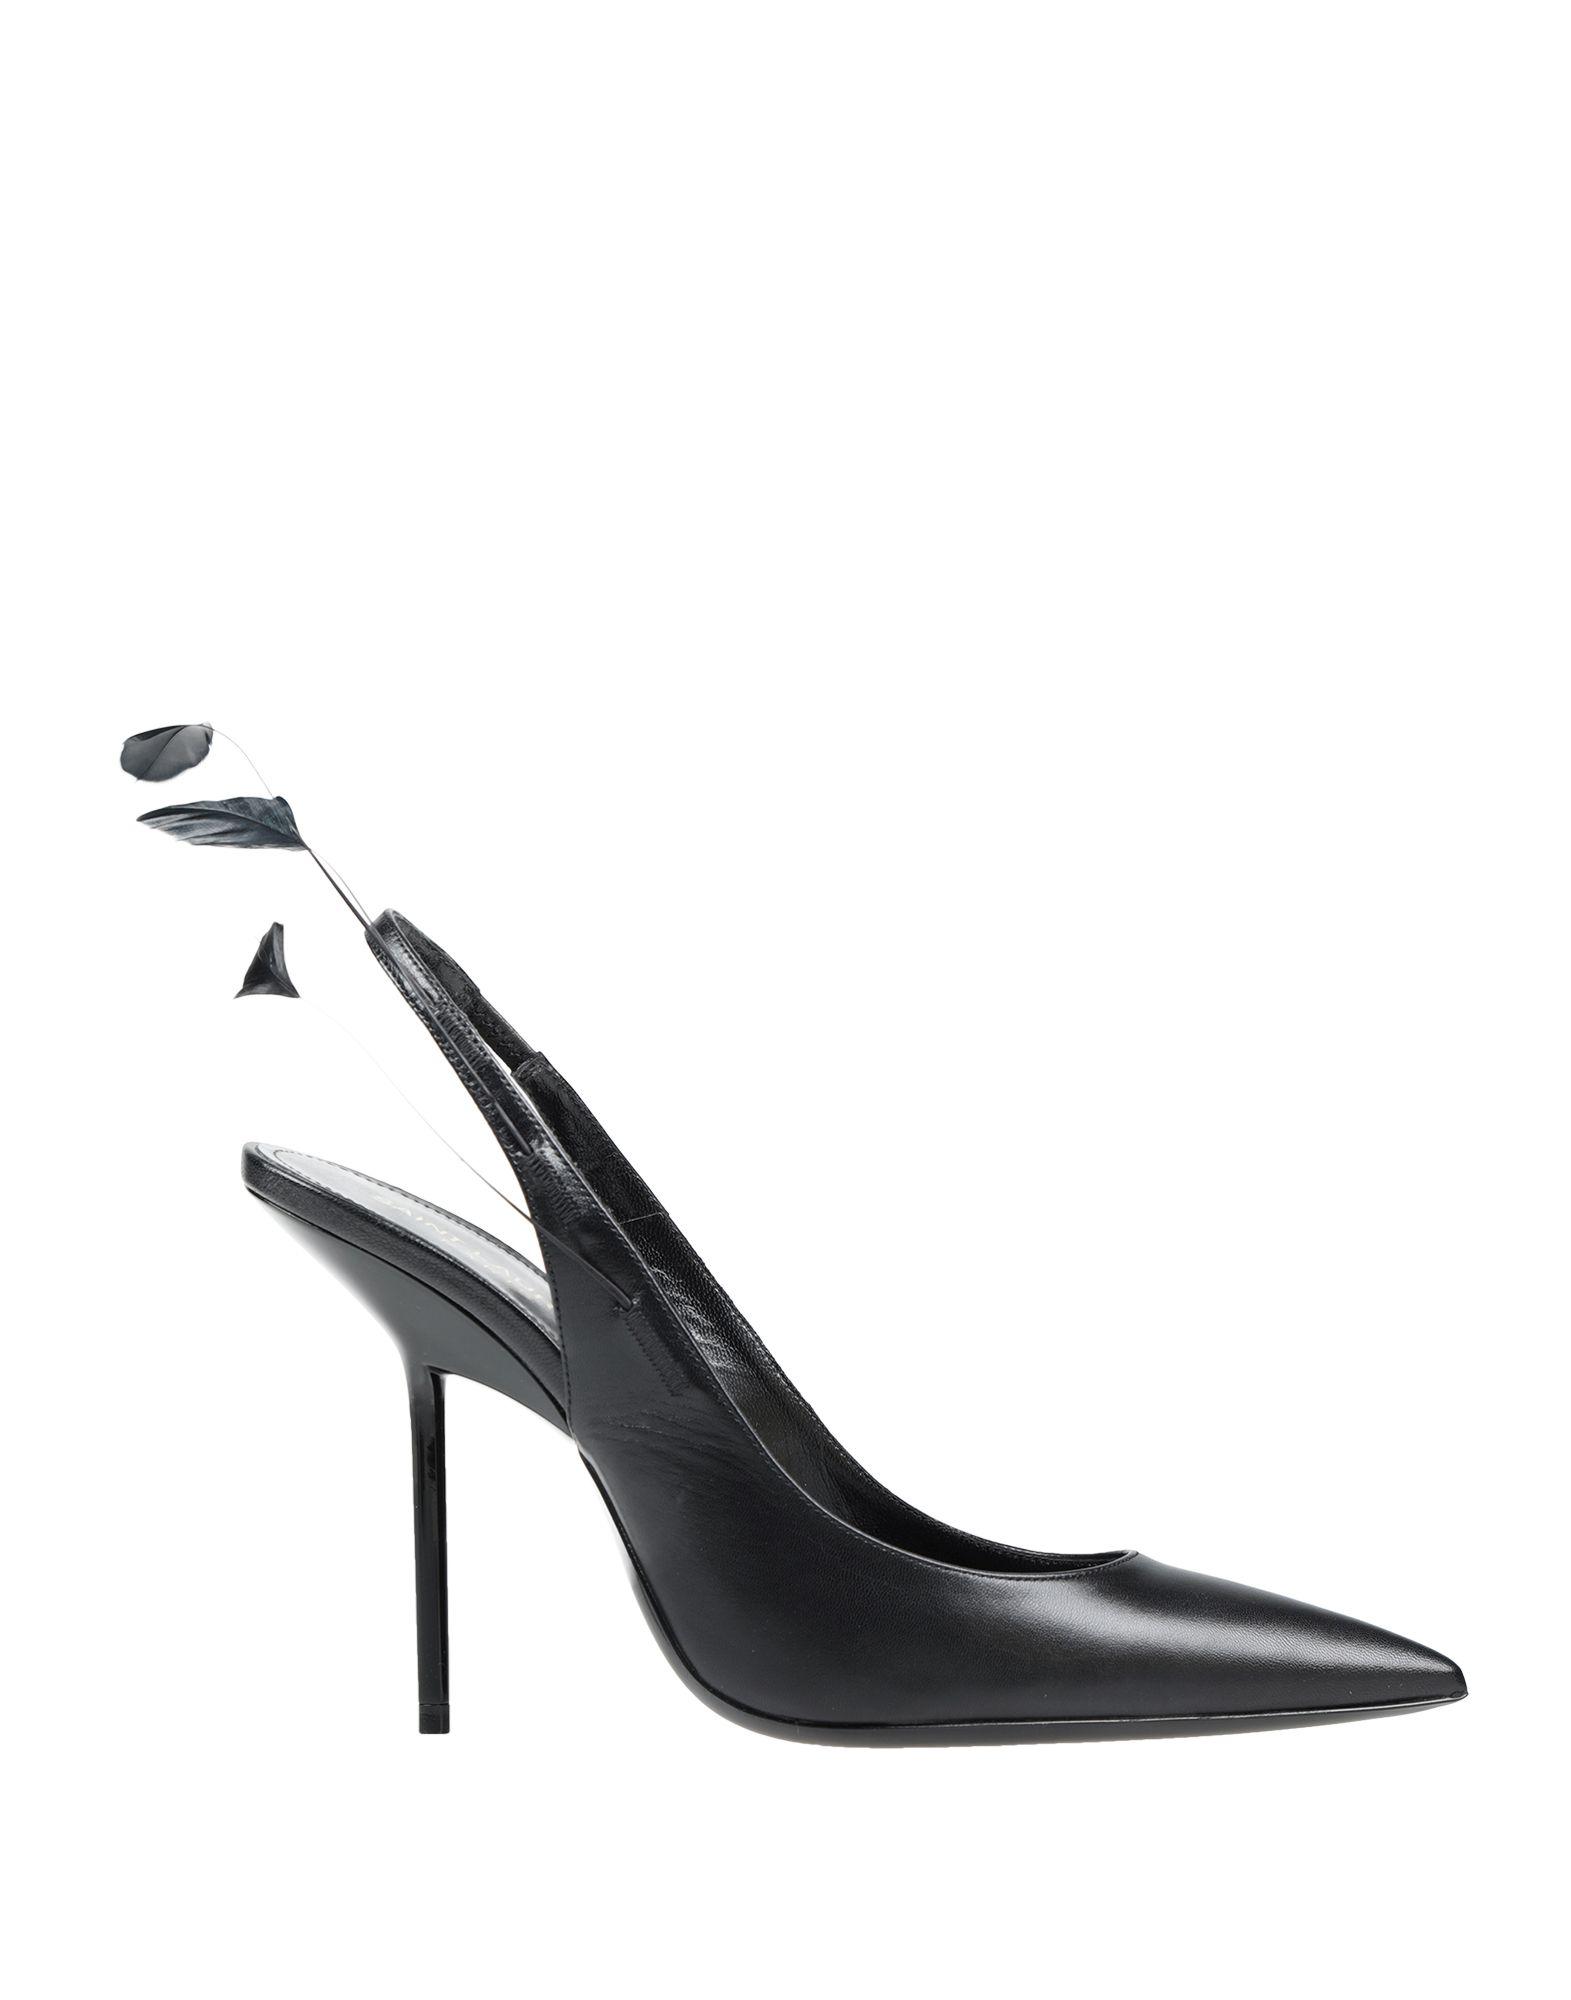 SAINT LAURENT Туфли цены онлайн